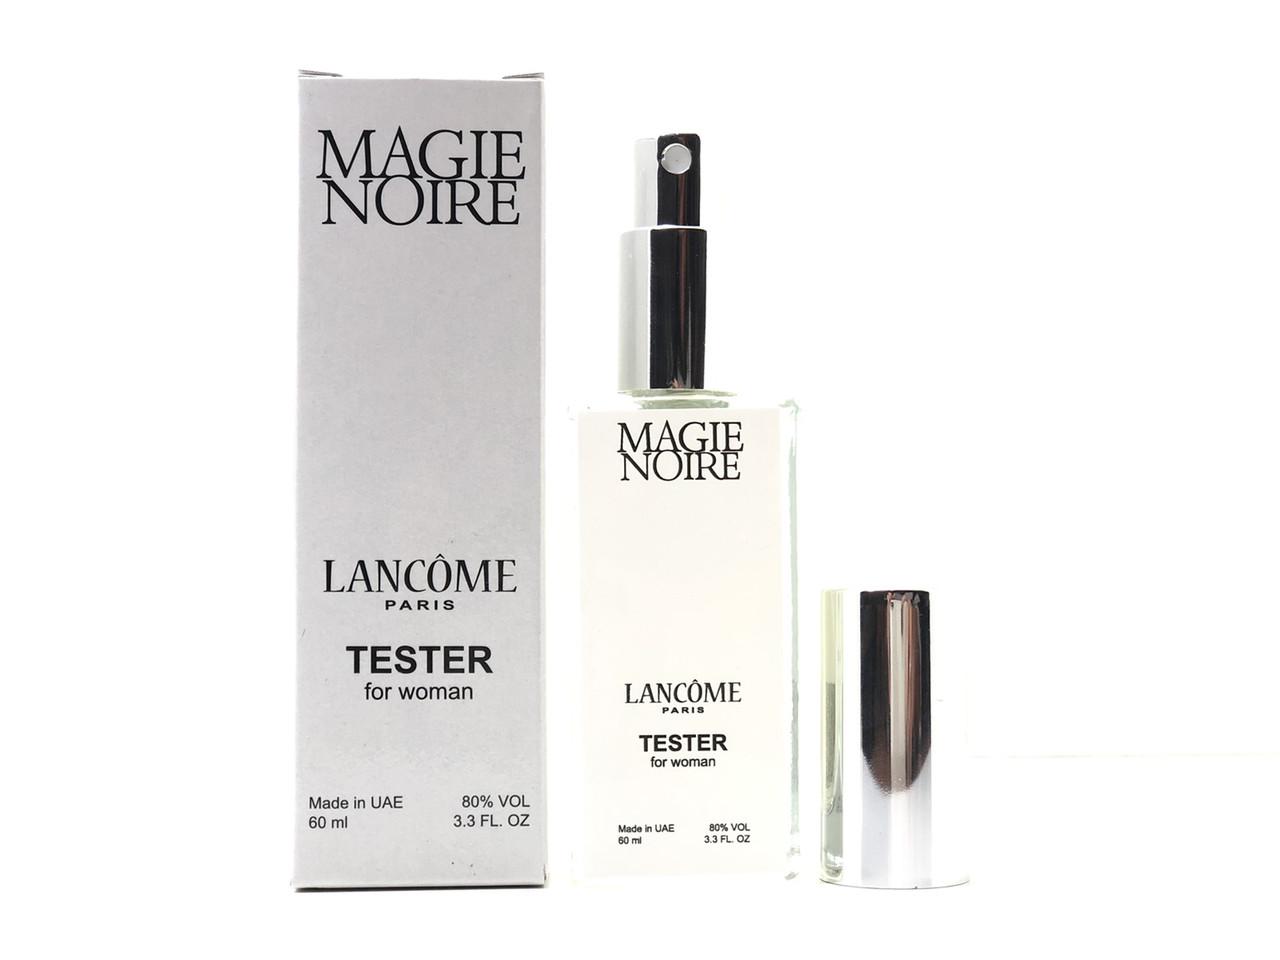 Тестер женский Lancome Magie Noire ( Ланком Меджи Ноир ) 60 мл